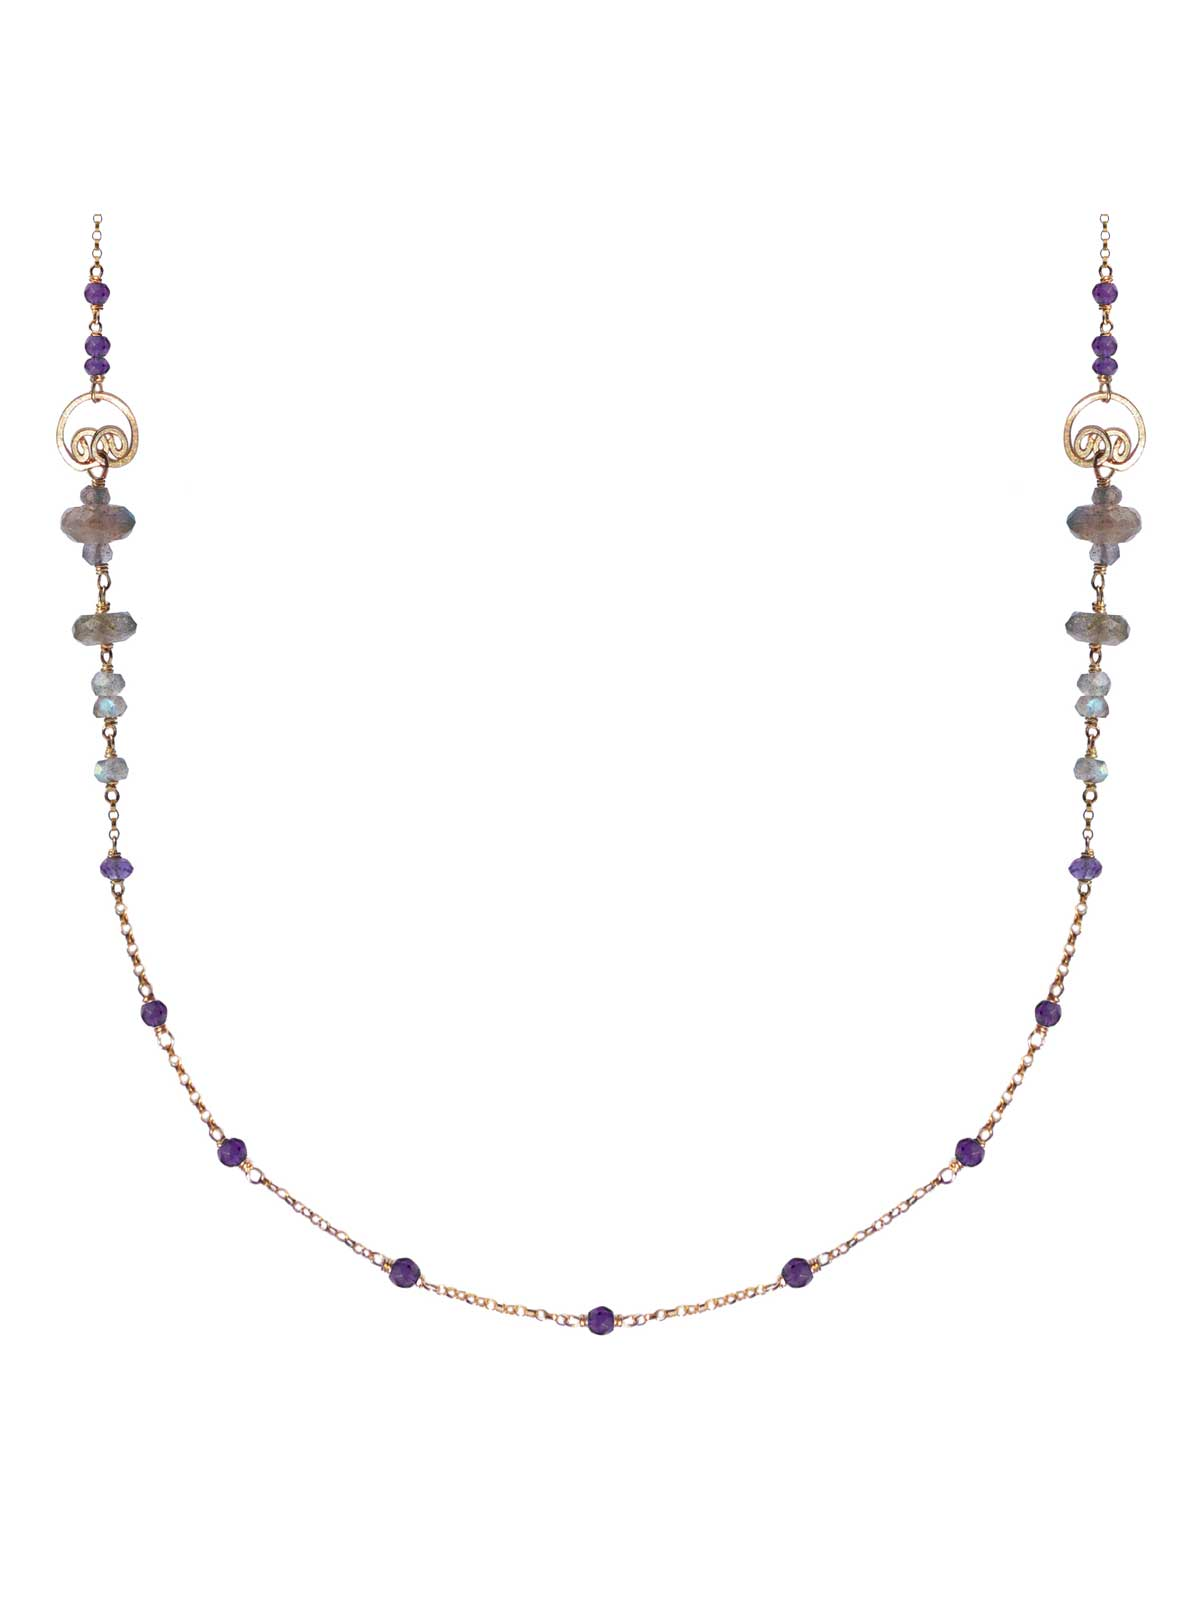 Buddha Necklace gold Labradorite Amethyst